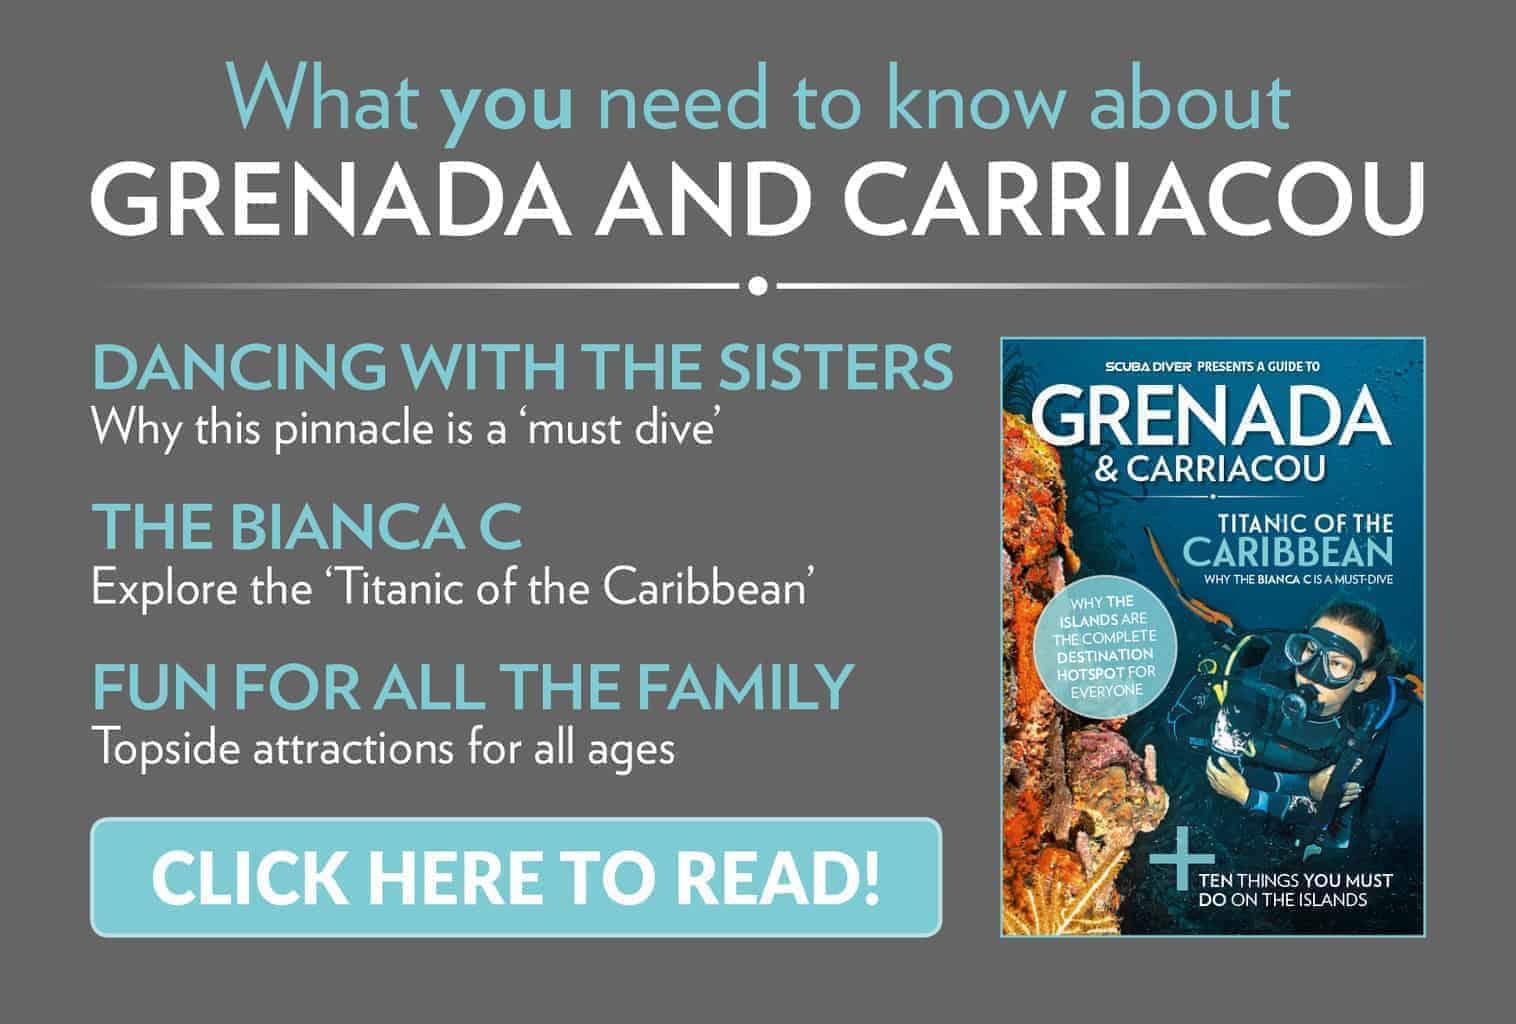 Grenada & Carriacou 1